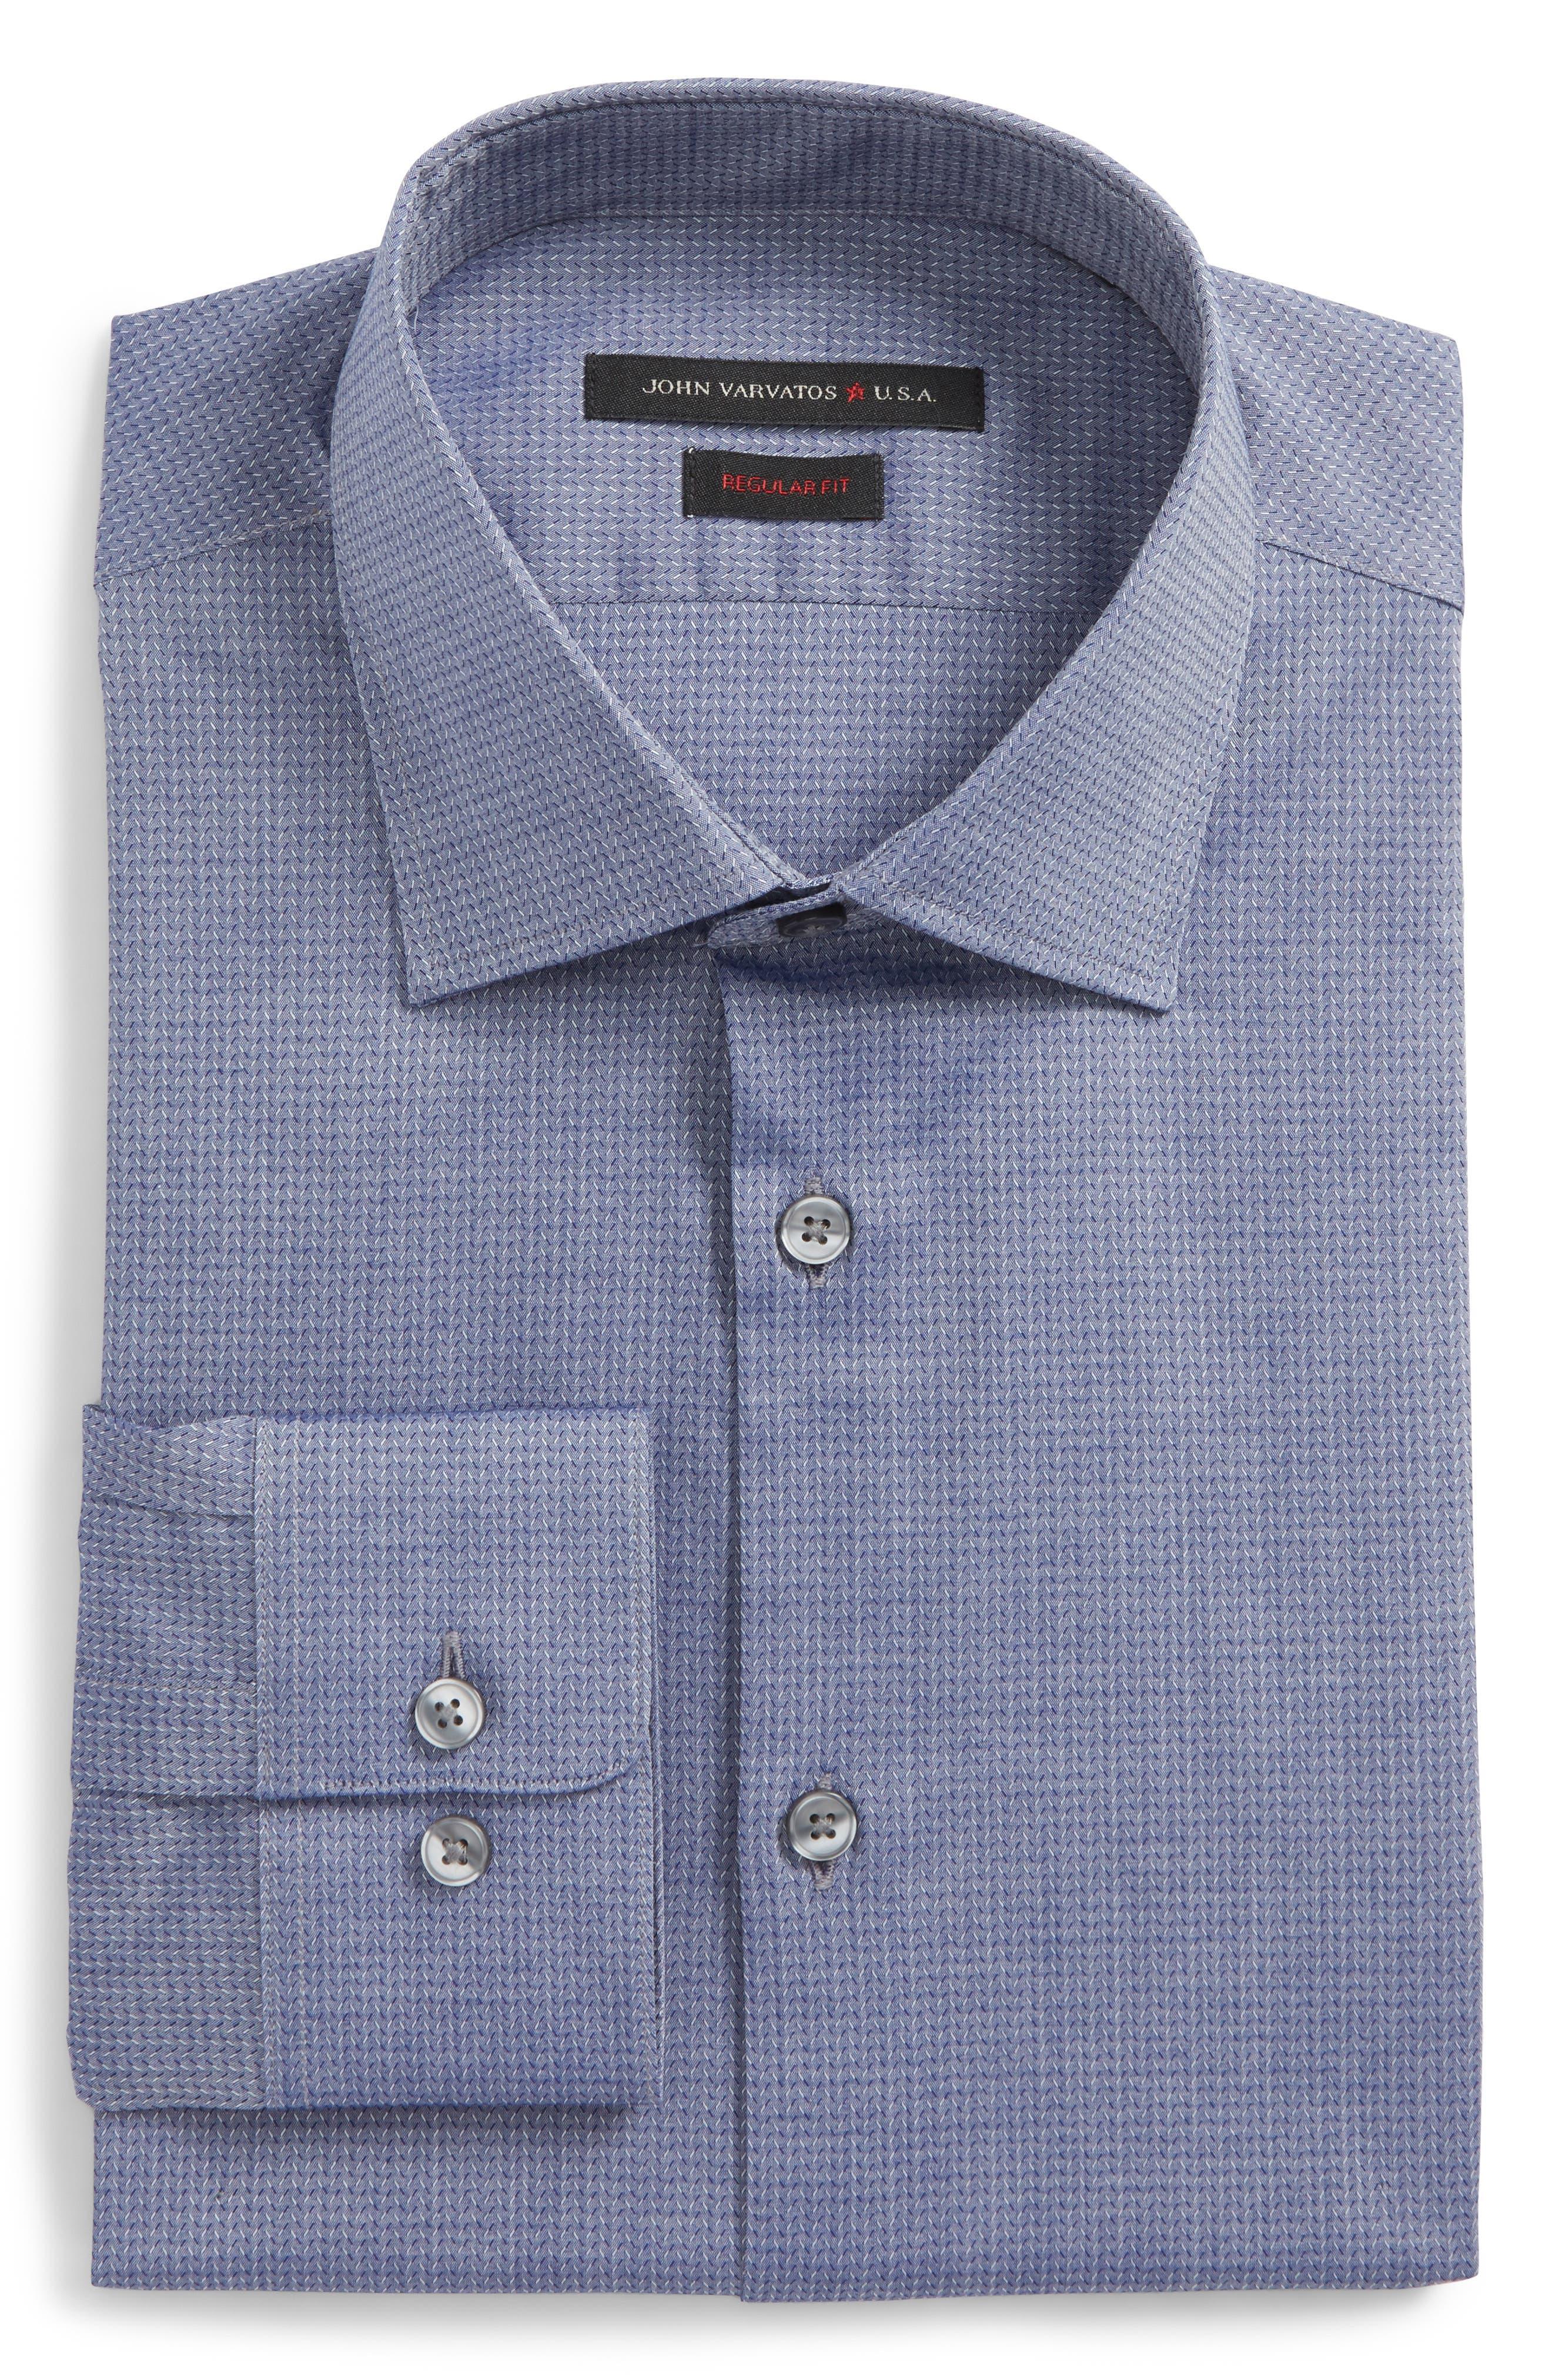 Regular Fit Stretch Print Dress Shirt,                             Alternate thumbnail 5, color,                             DEEP BLUE